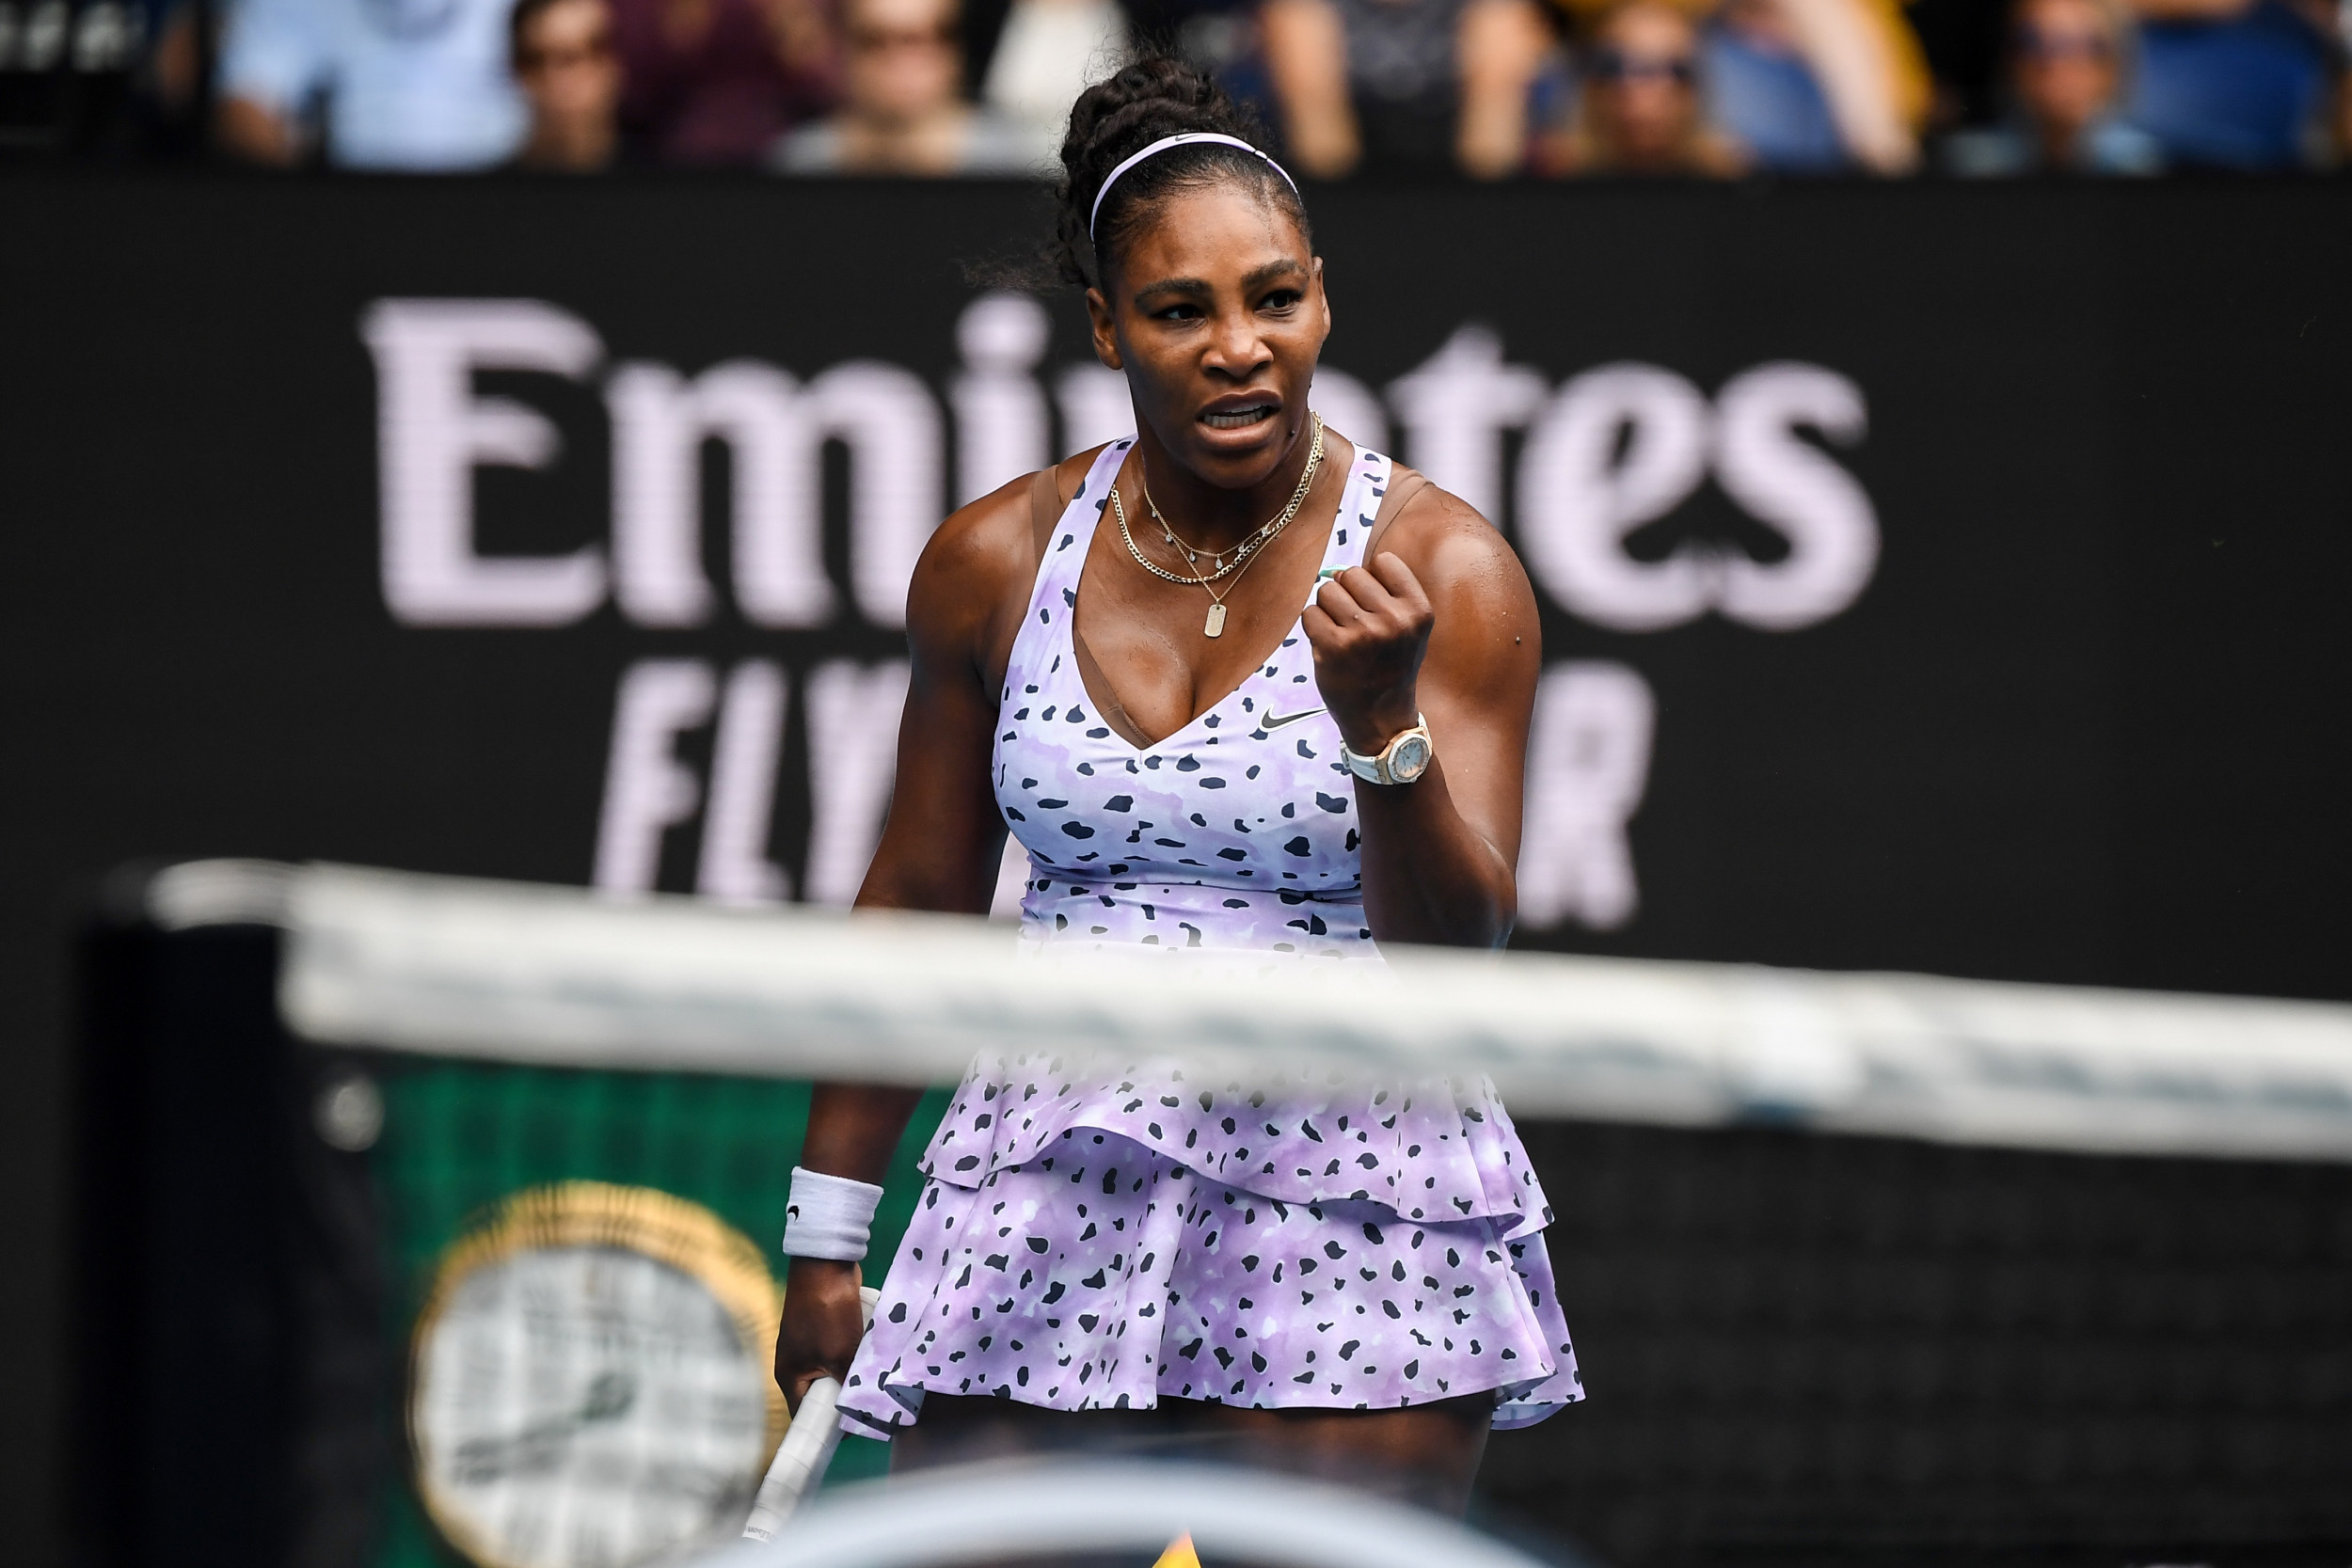 Australian Open 2020 Draw How To Watch Serena Williams Roger Federer Novak Djokovic Second Round Matches Start Times Live Stream